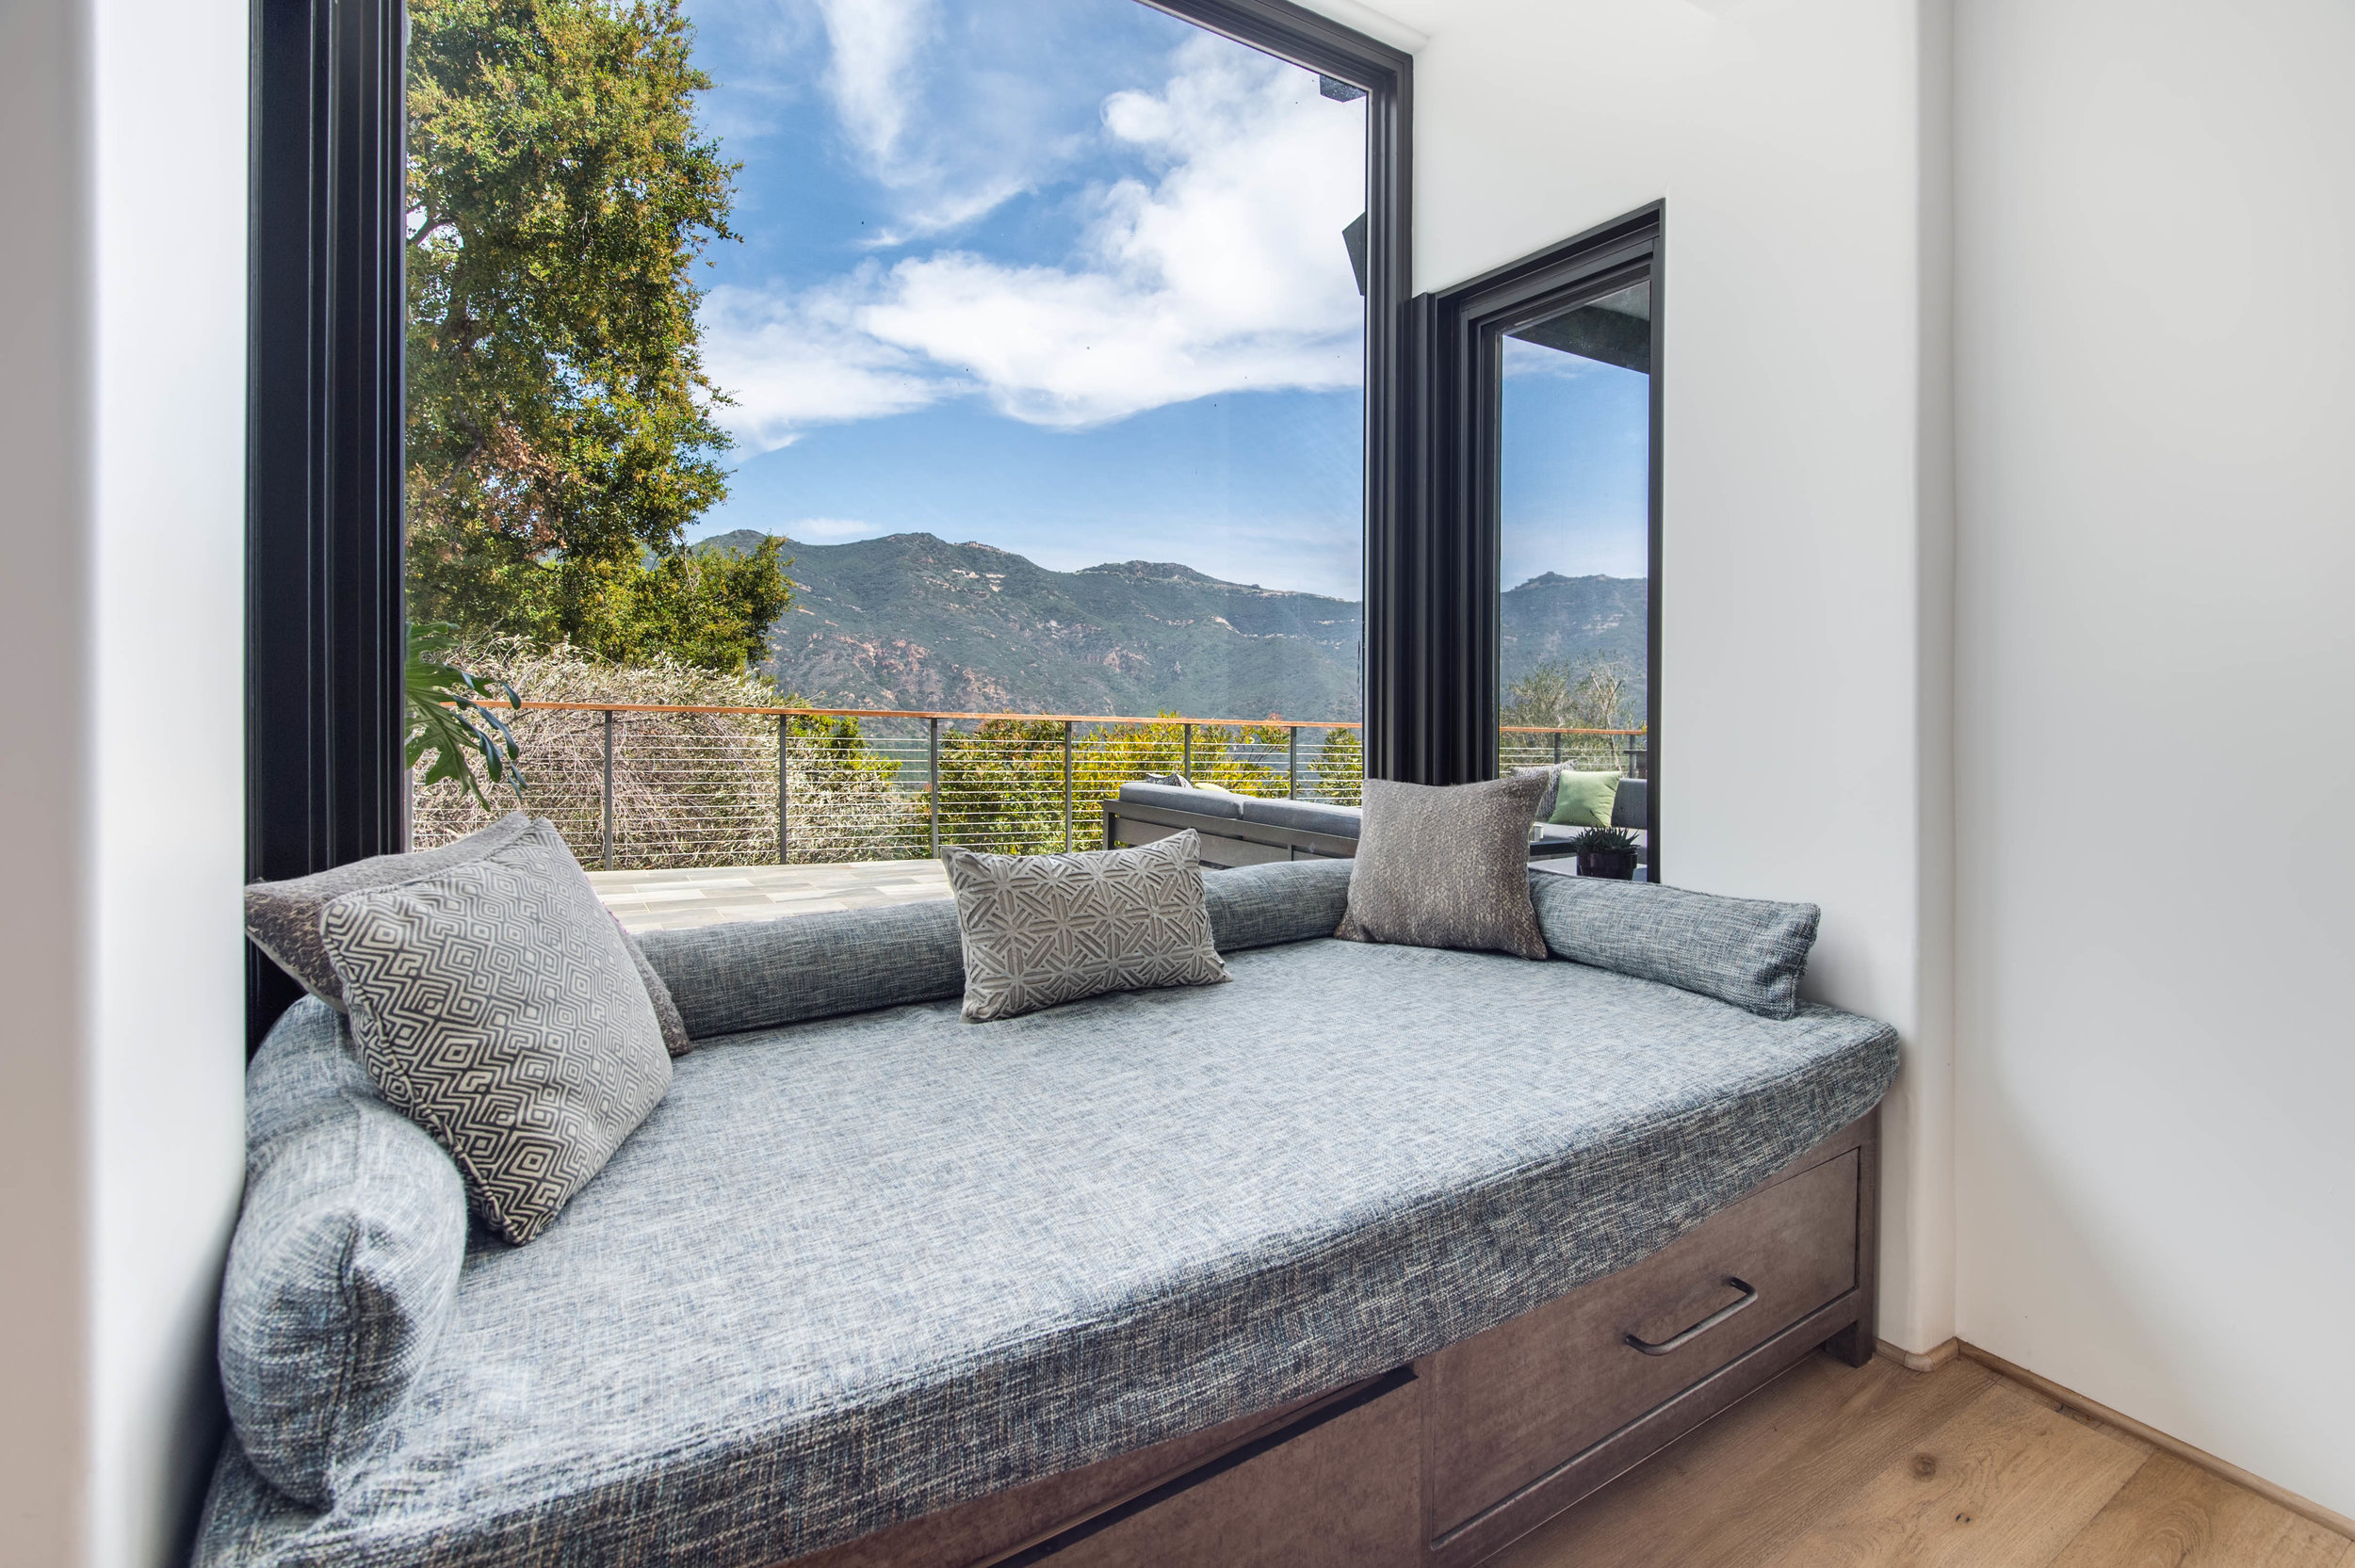 016 Living Room 26272 Cool Glen Way Malibu For Sale Luxury Real Estate.jpg